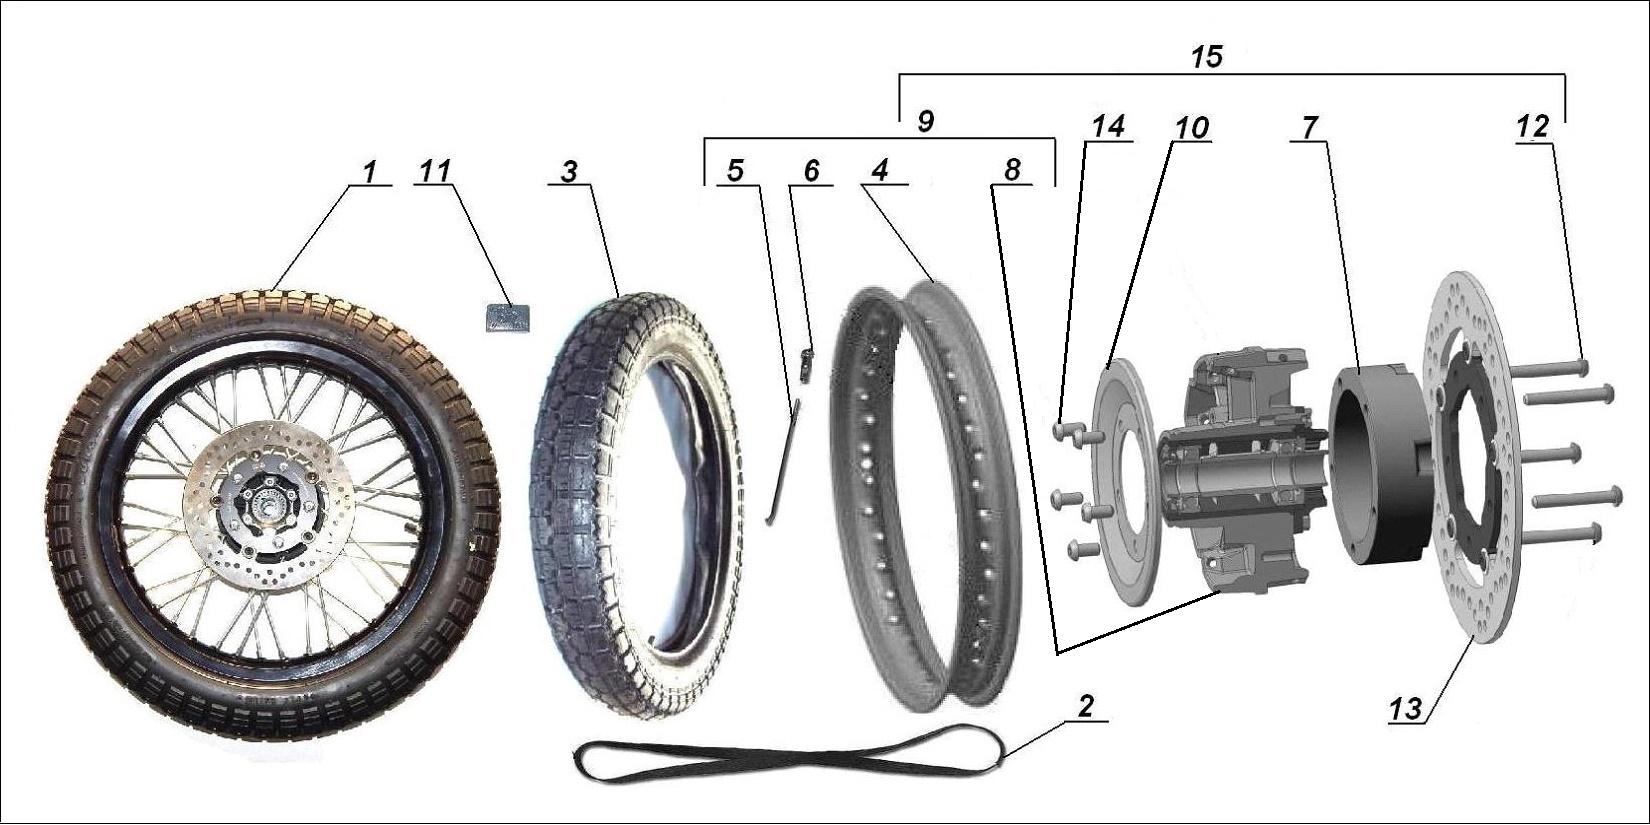 Black sidecar wheel